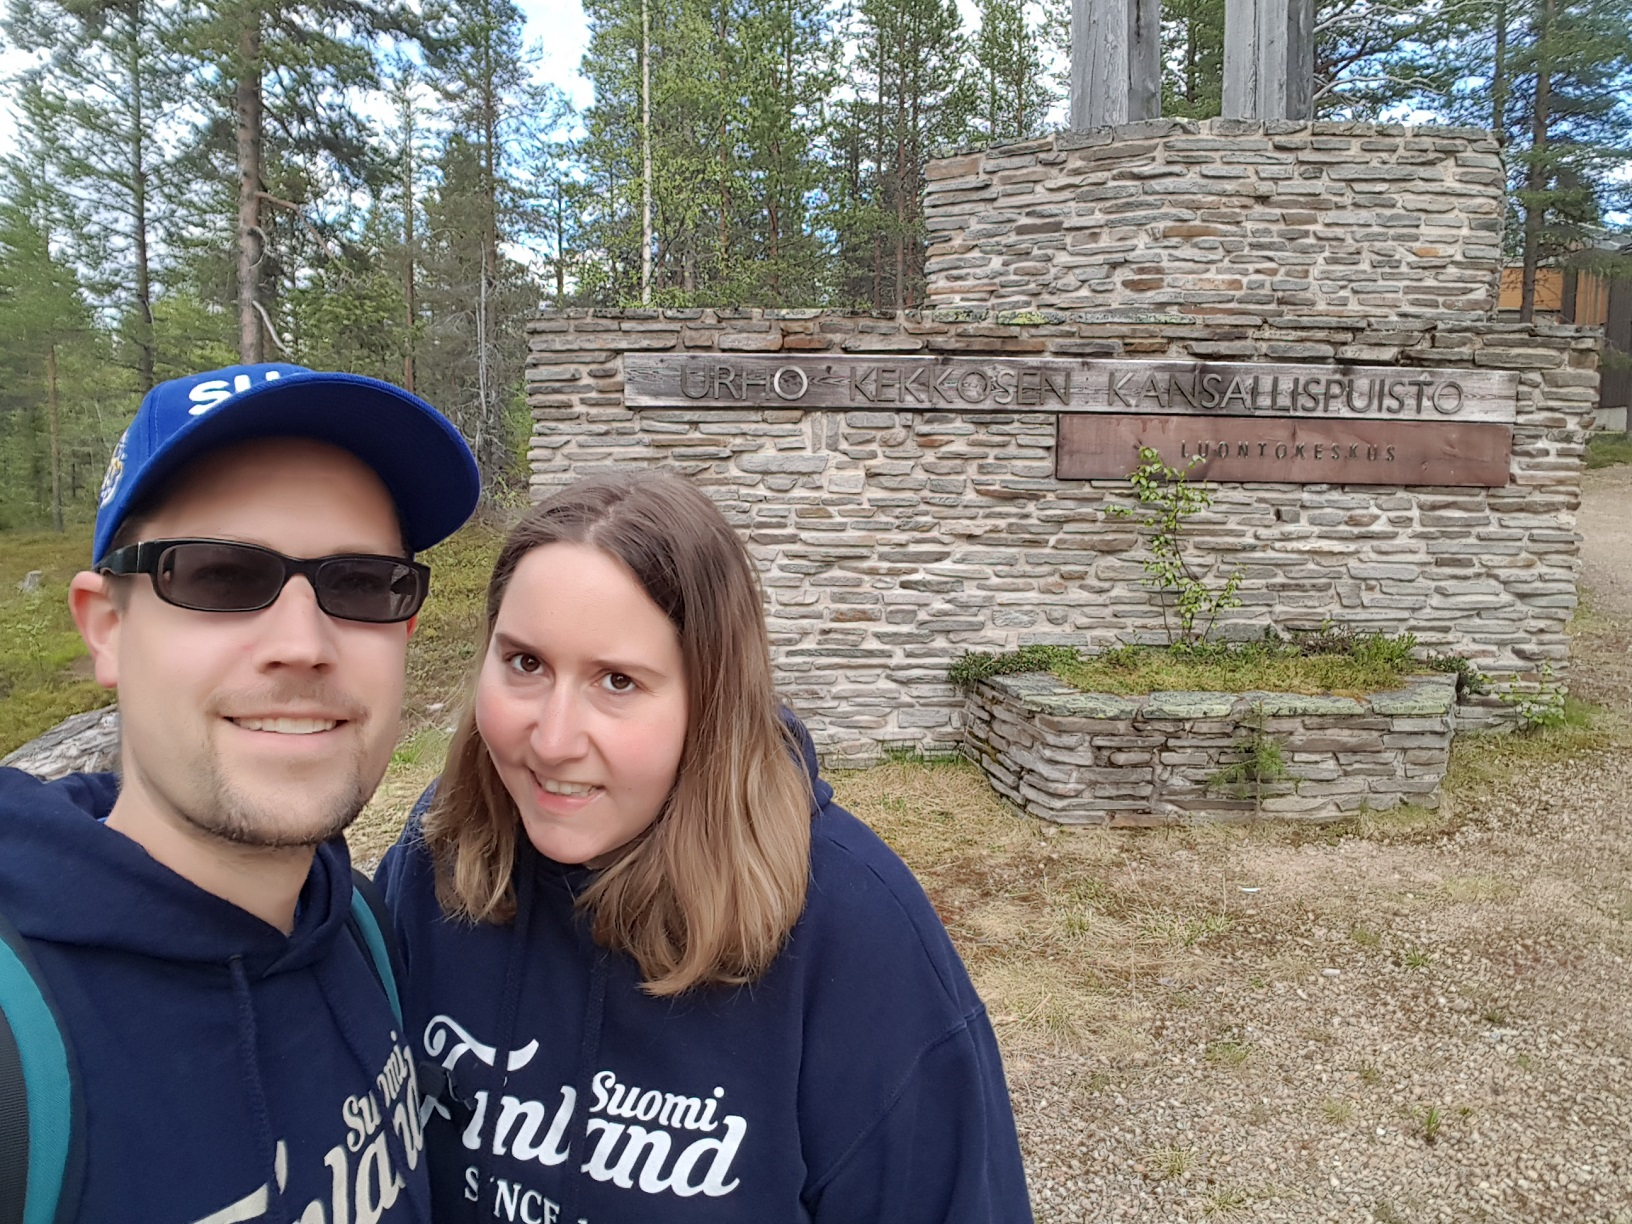 Eingang Urho-Kekkonen-Nationalpark